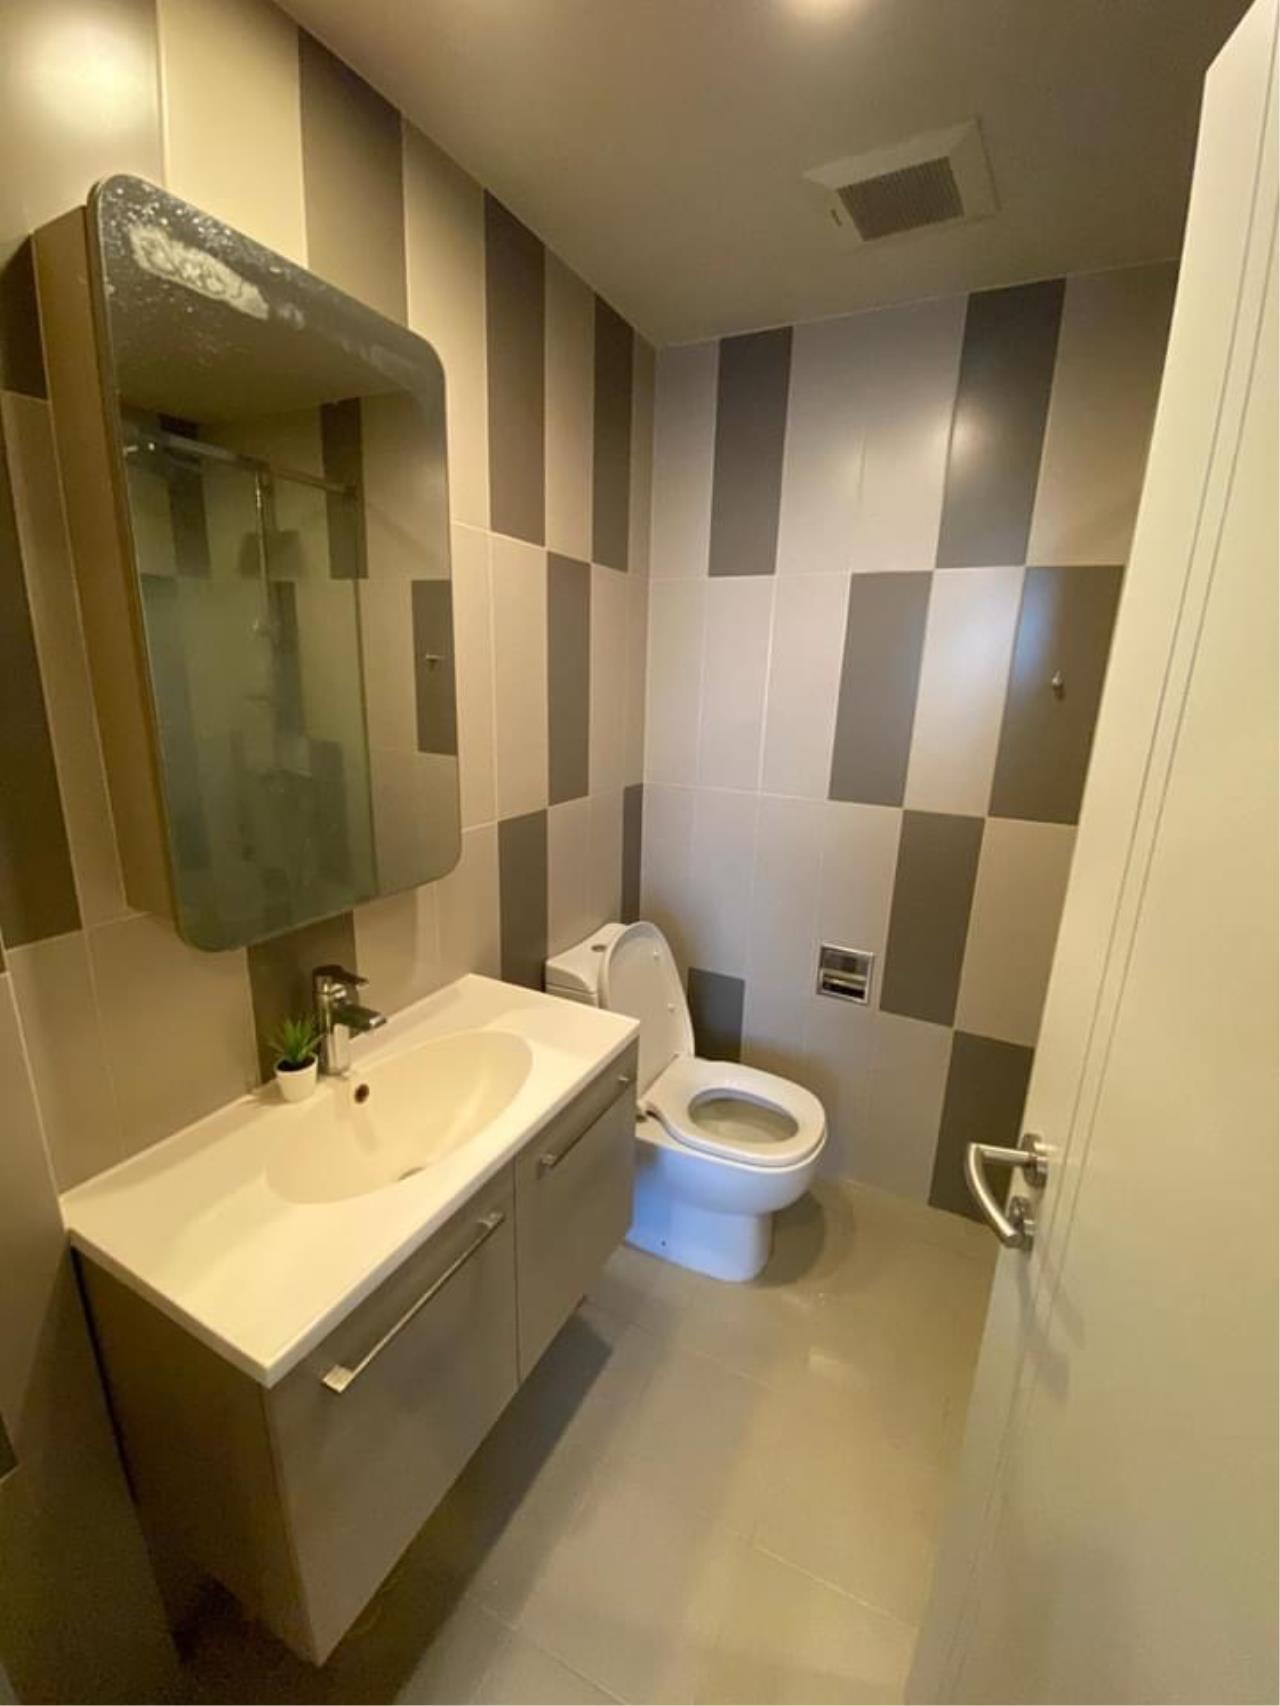 Agent - Phapayawarin Agency's Onyx Phaholyothin for Rent, 1 Bedroom 1 Bathroom, 31 Sq.m., BTS Saphan Khwai 11